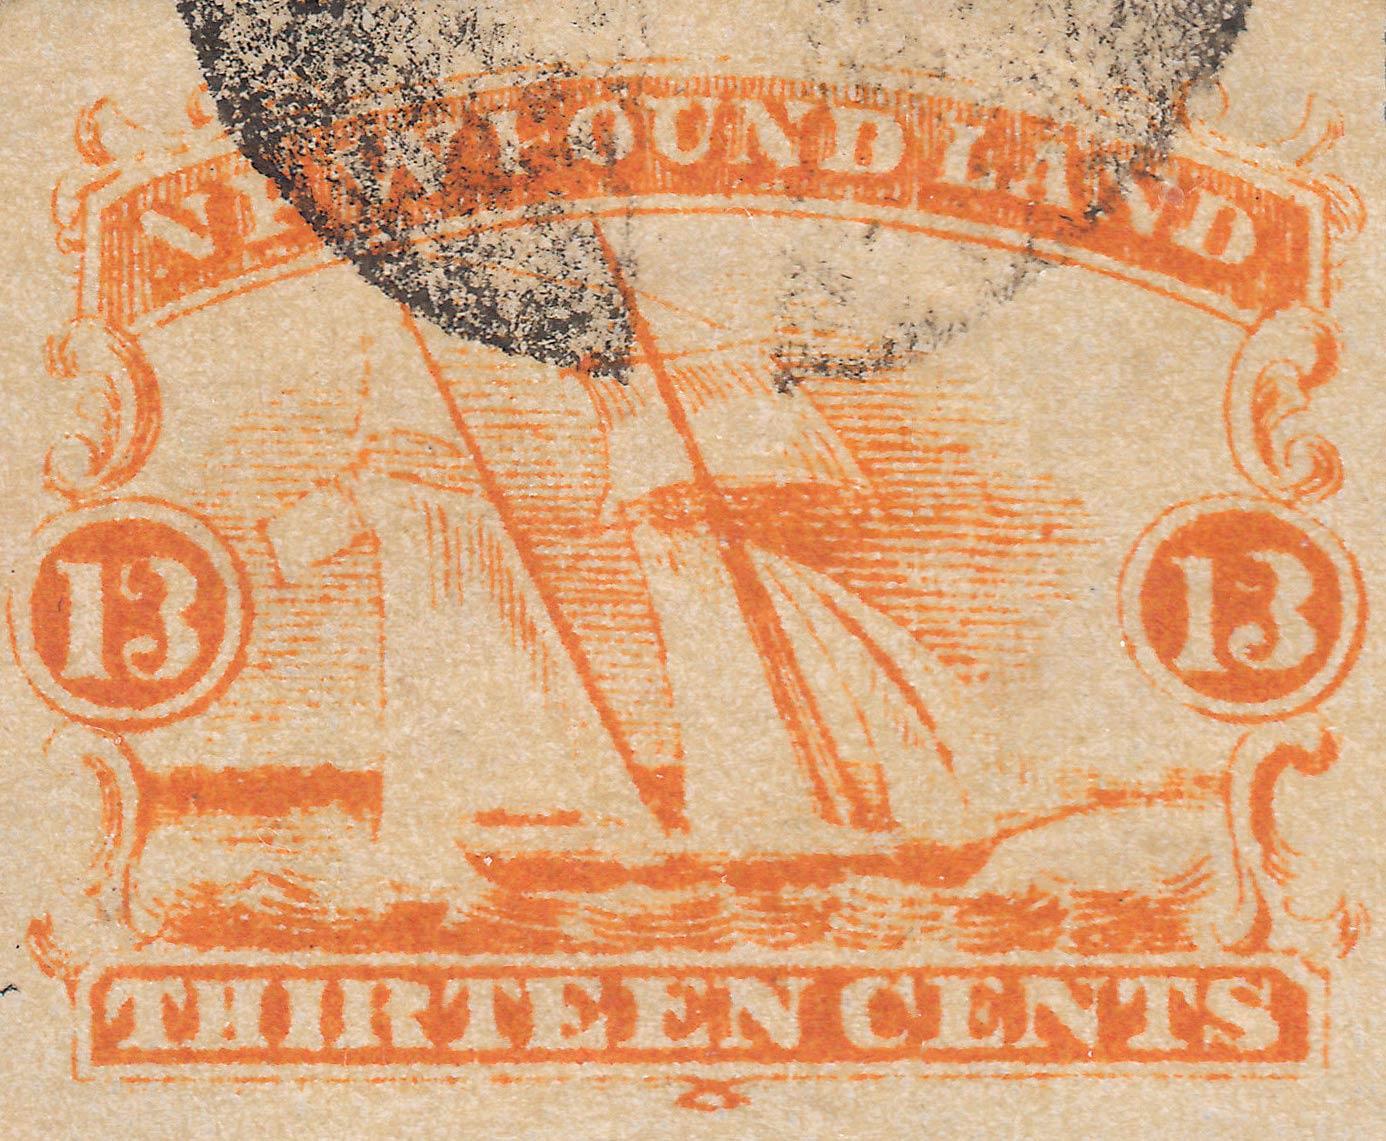 Newfoundland_1866_Schooner_13c_Forgery